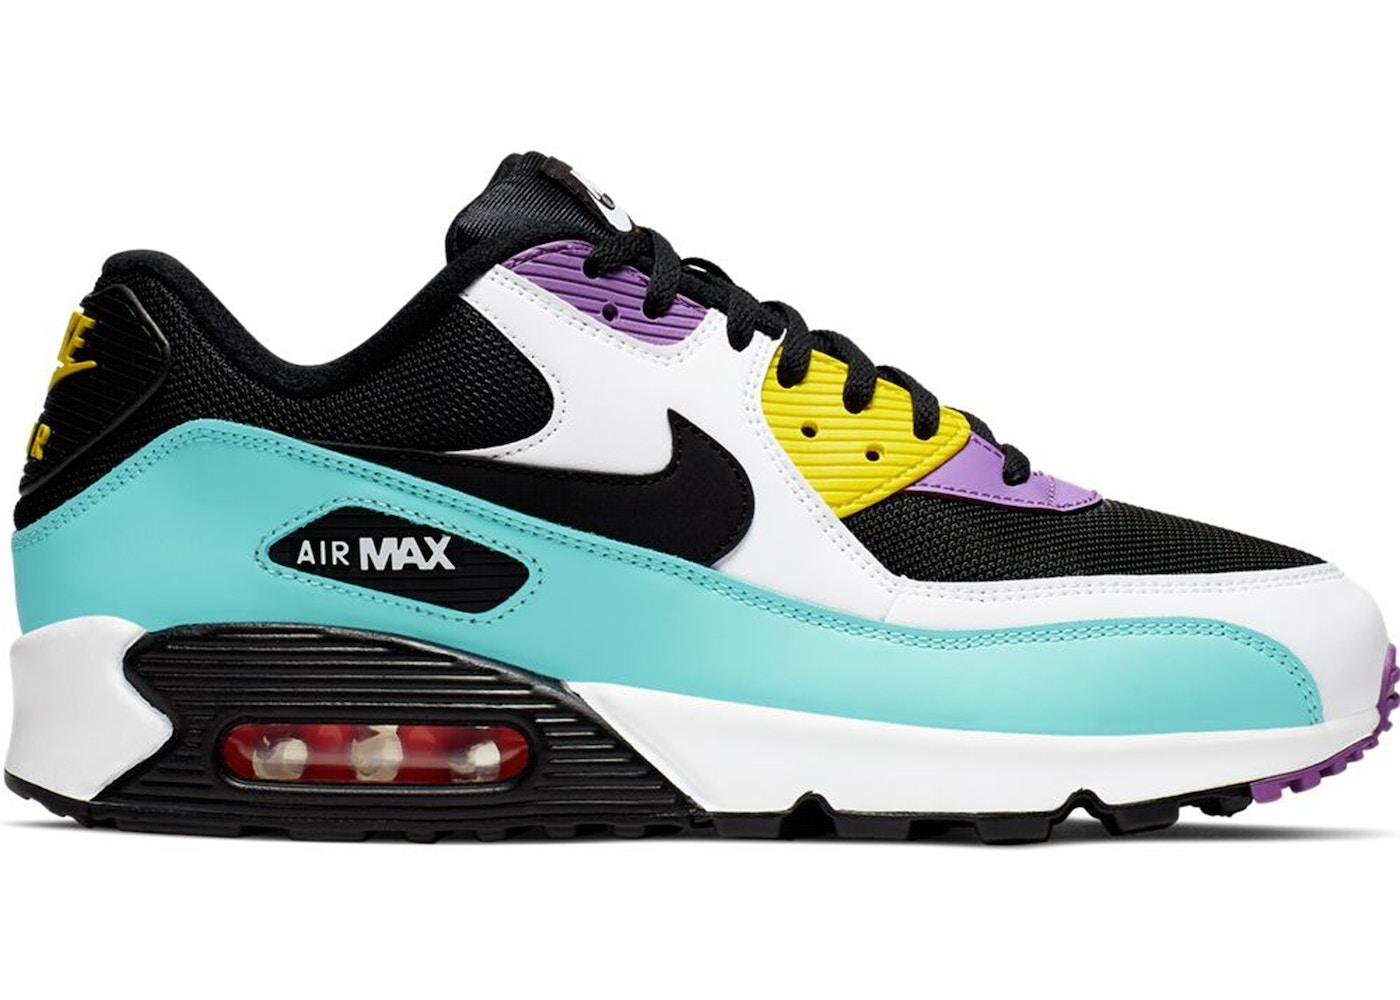 separation shoes 9e6f5 3ccb8 Air Max 90 Black Bright Violet White